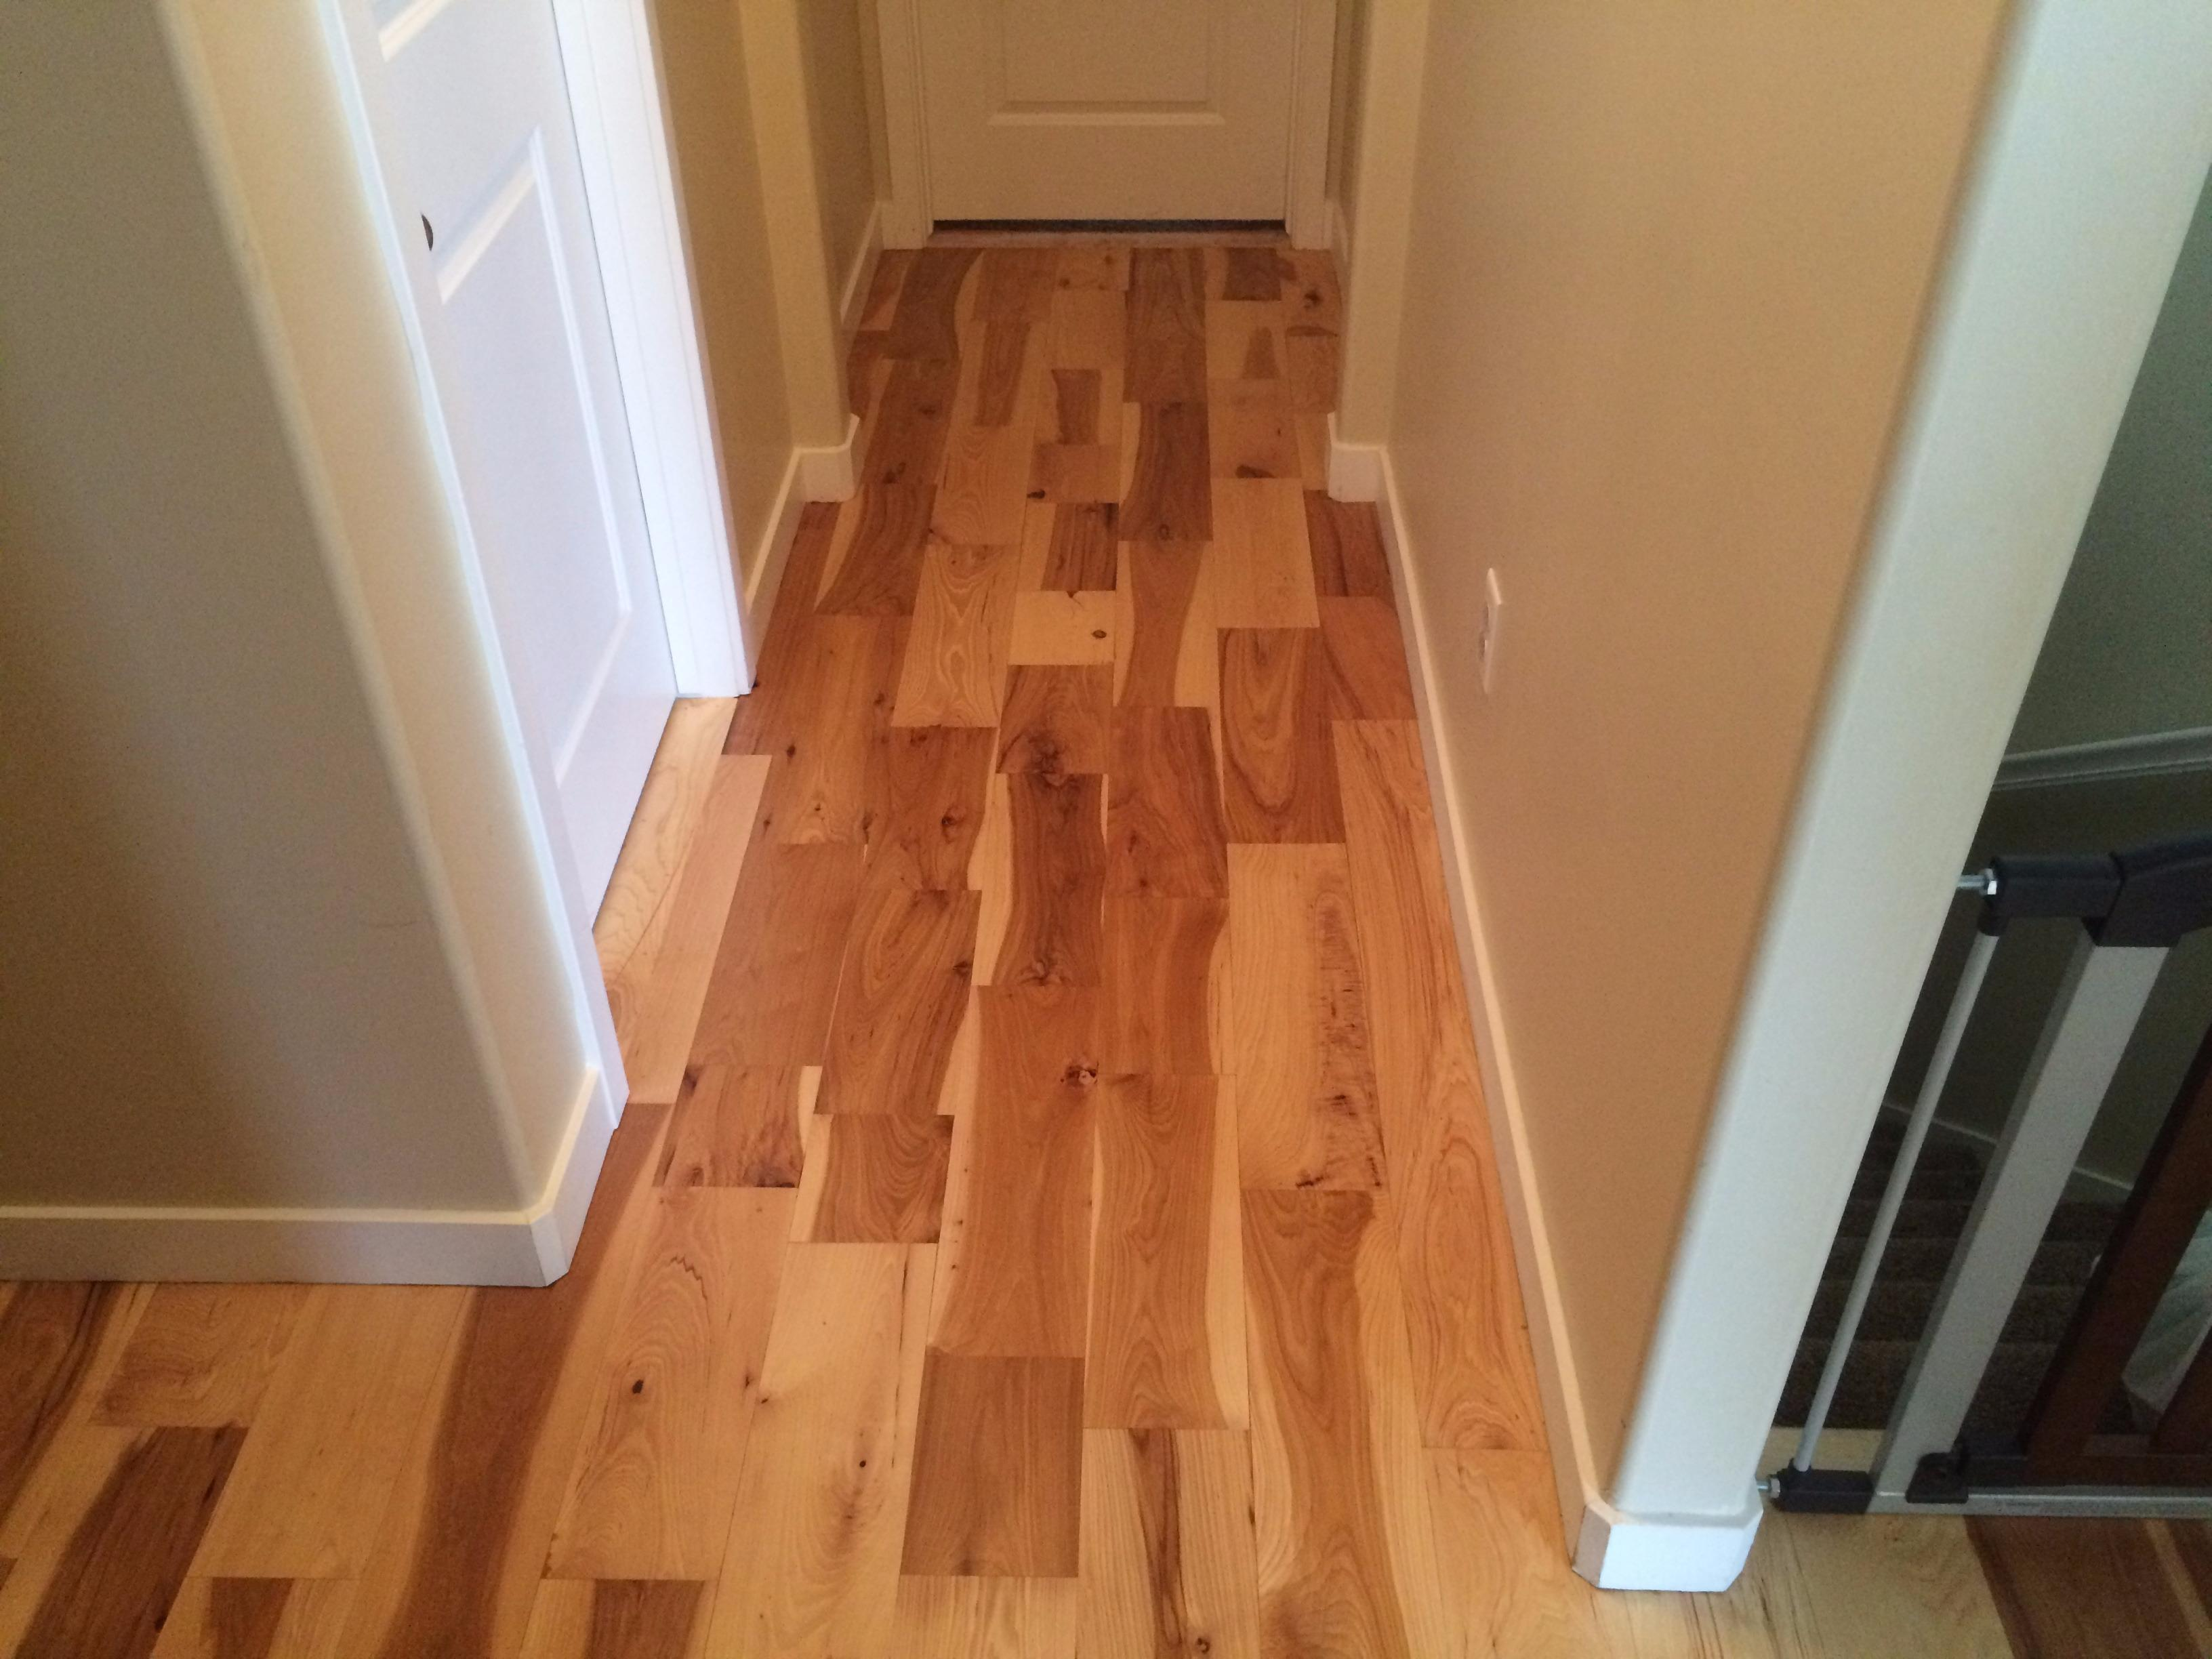 Lambert Hardwood Flooring image 1